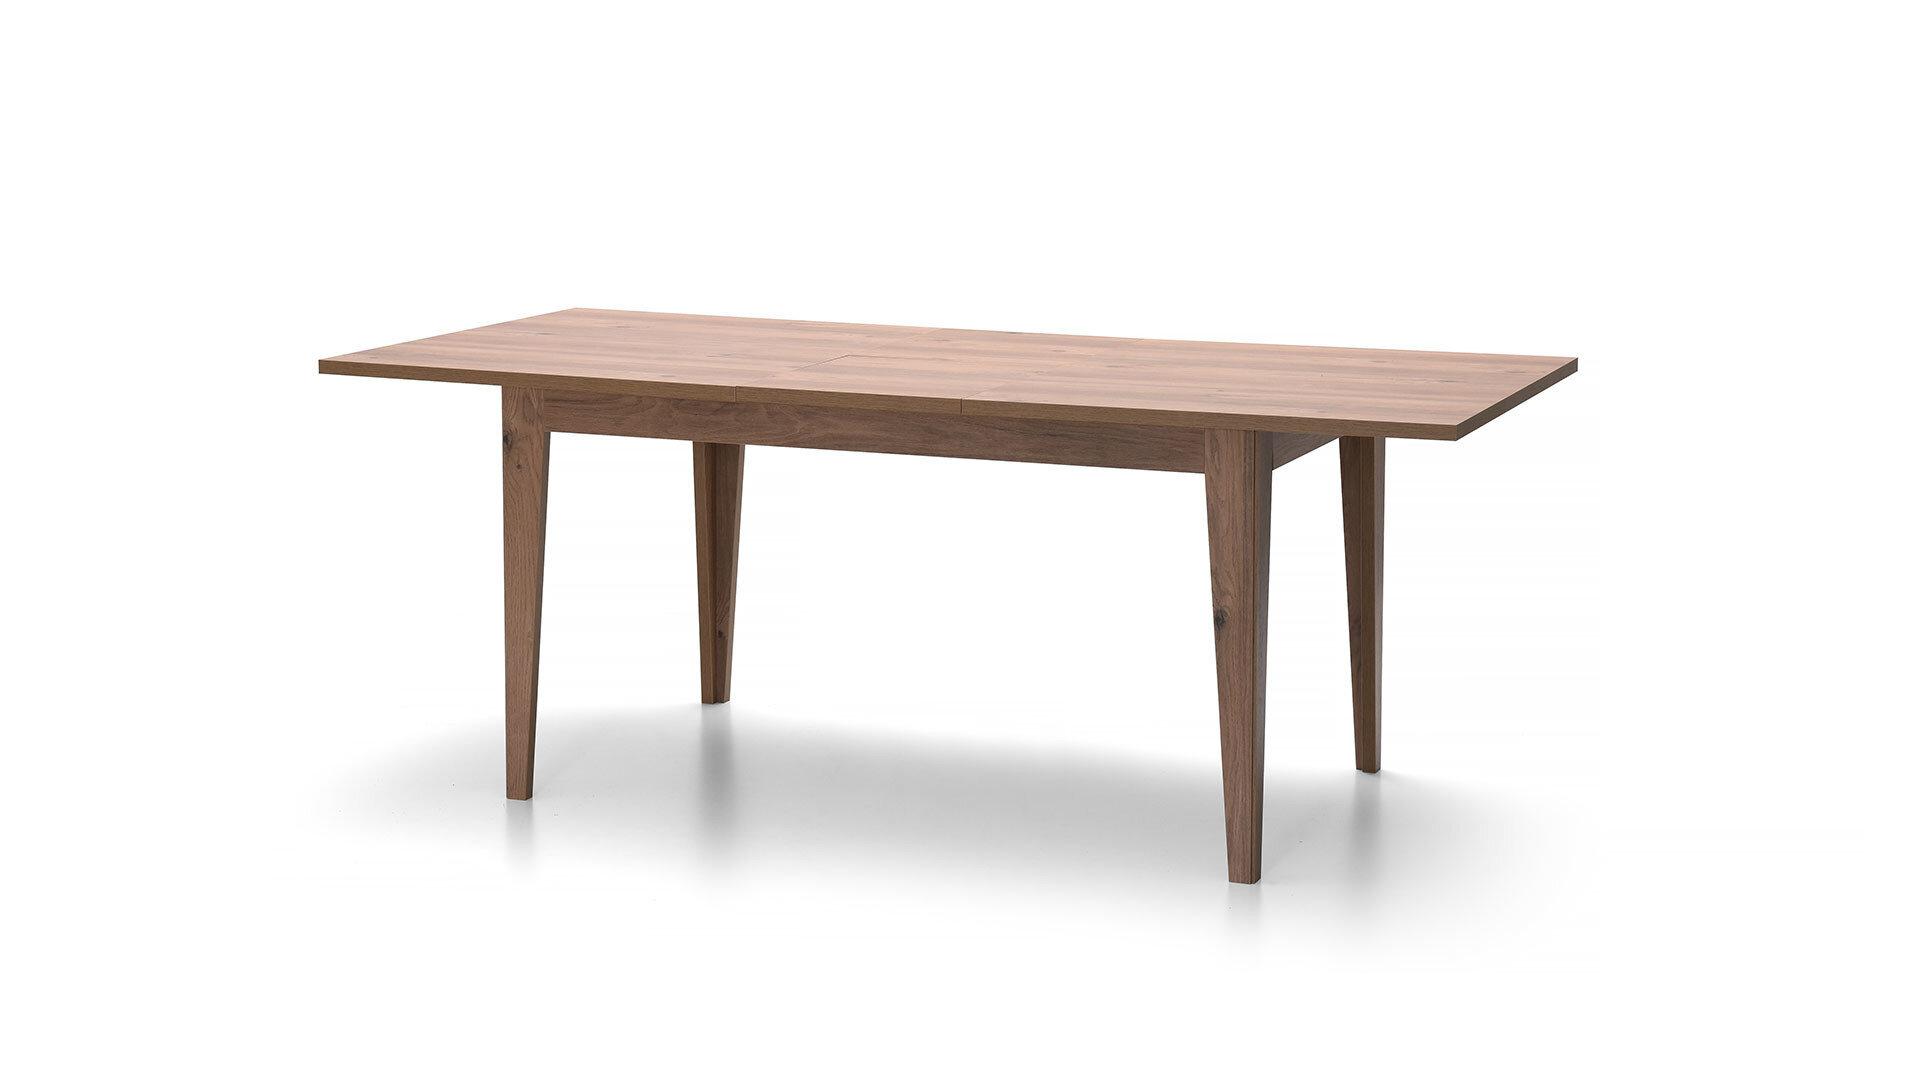 Ravenna Açılır Yemek Masası 90X160